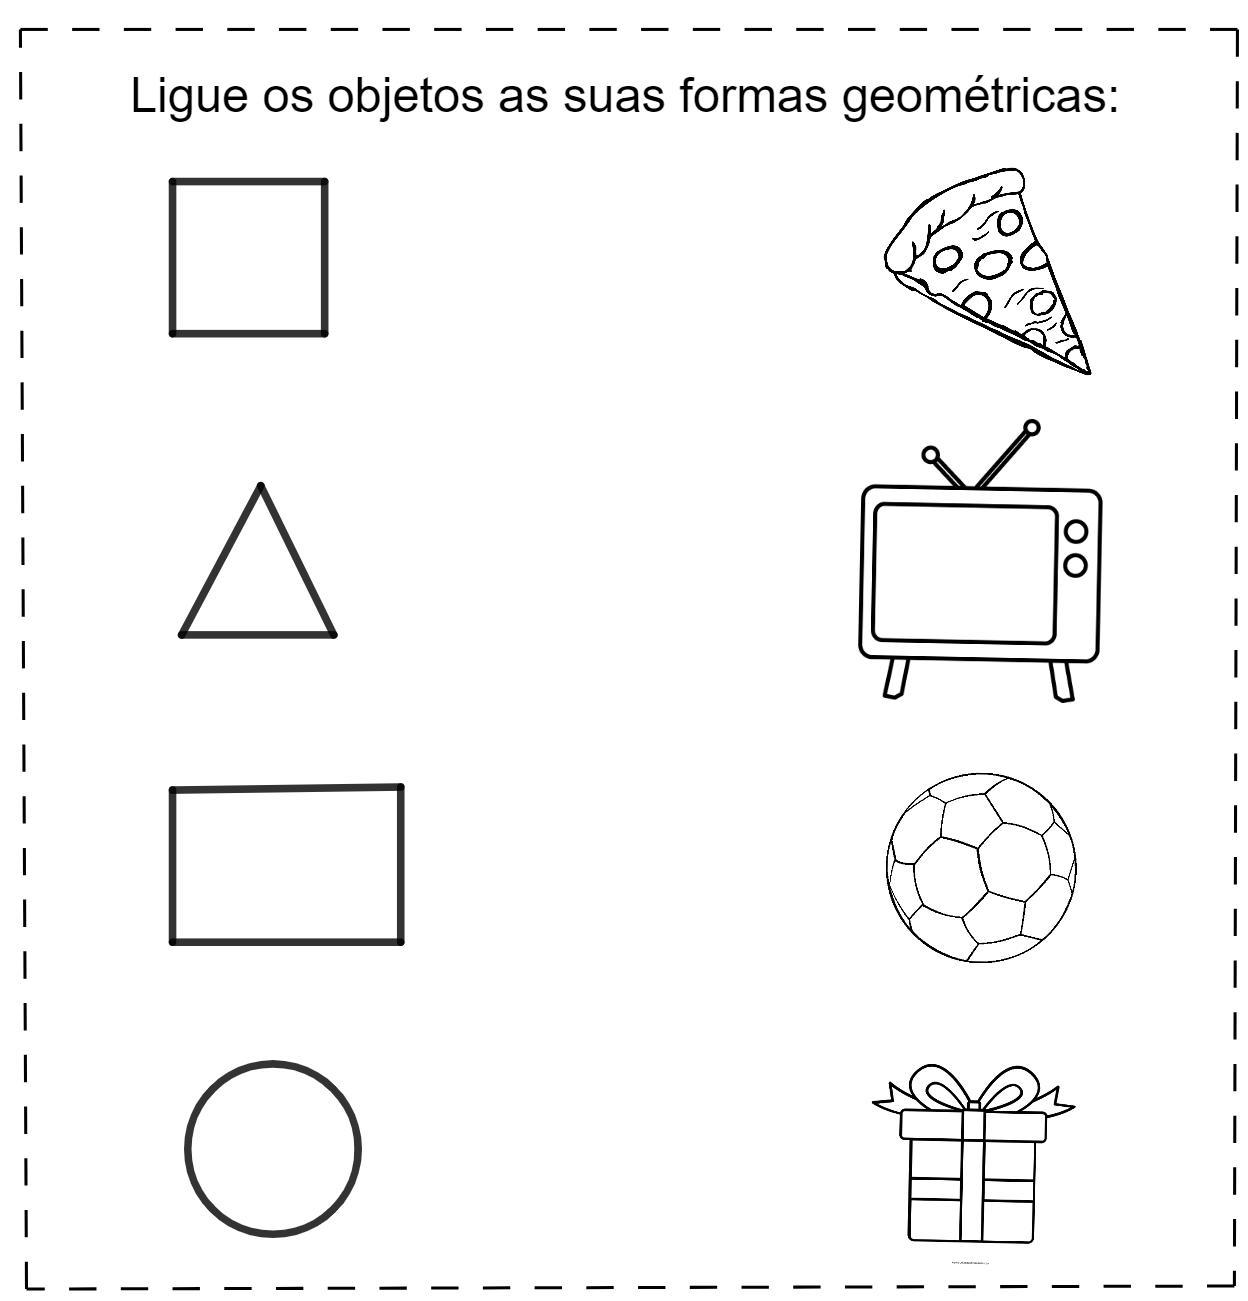 Atividades para classificar formas geométricas